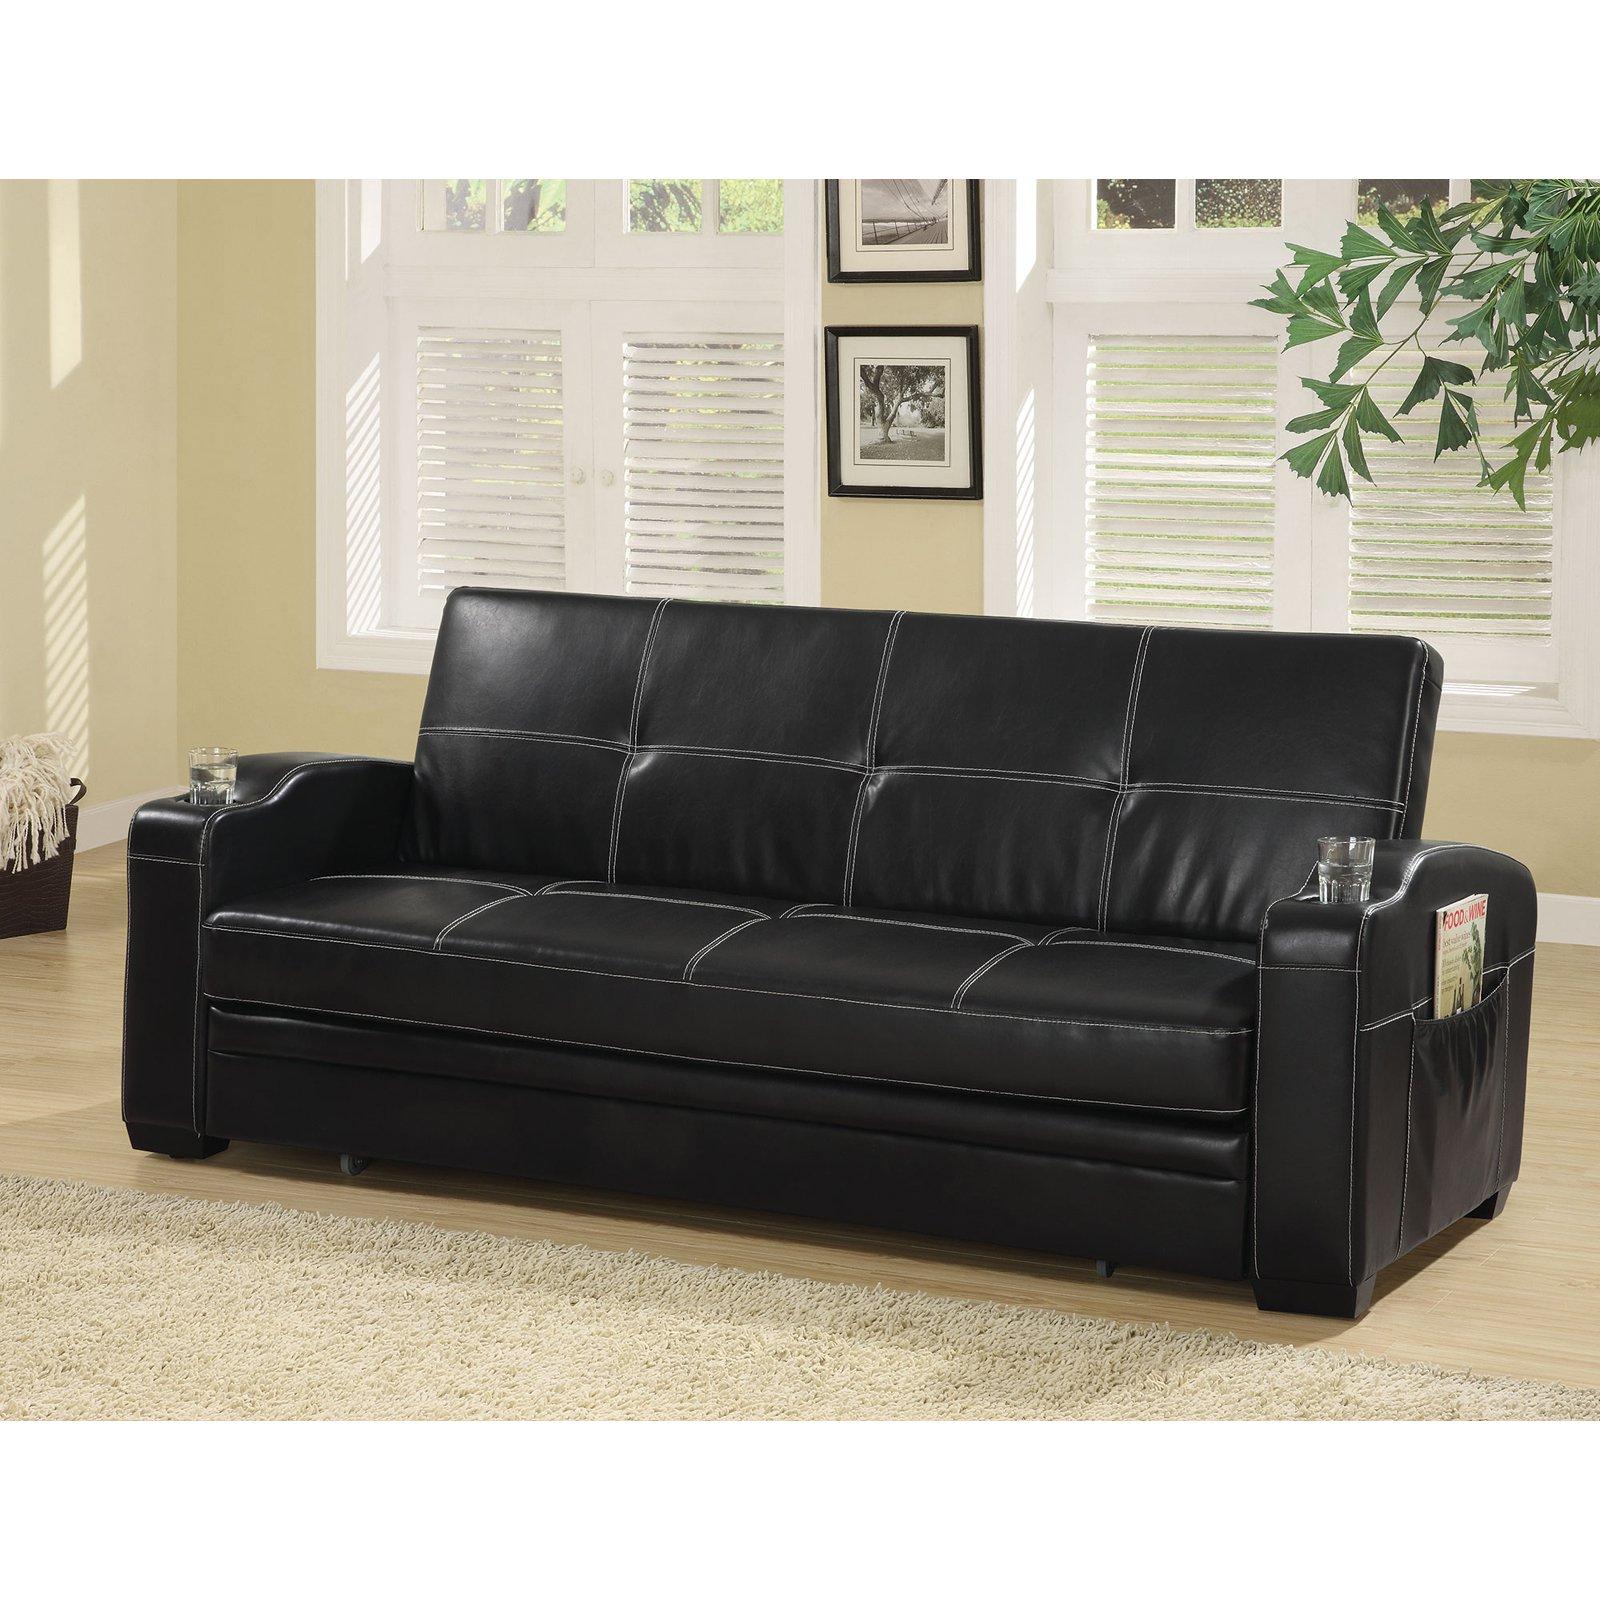 Coaster Bellevue Convertible Sofa